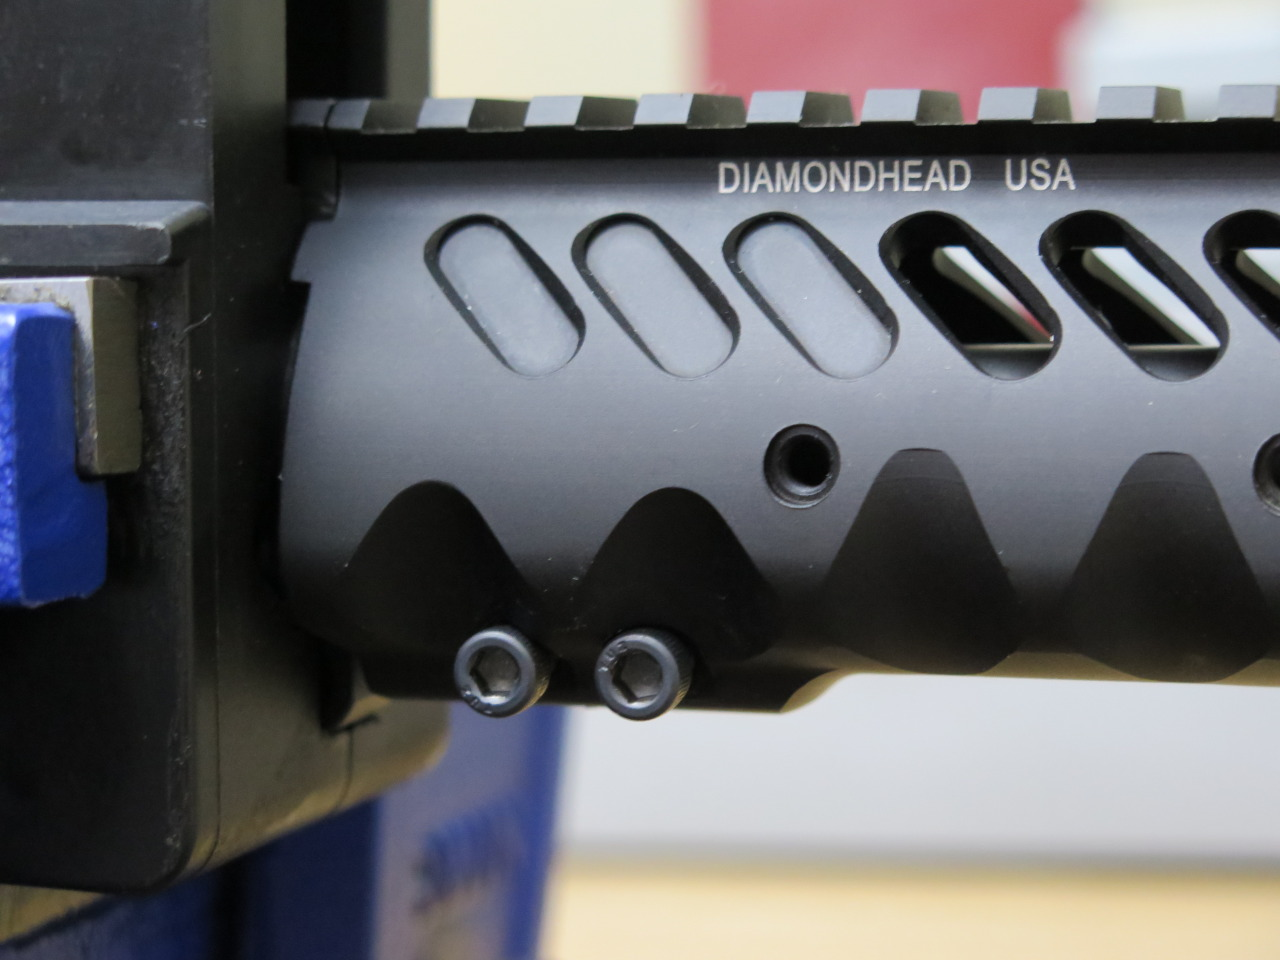 Just Two Screws to Install the Diamondhead Handguard